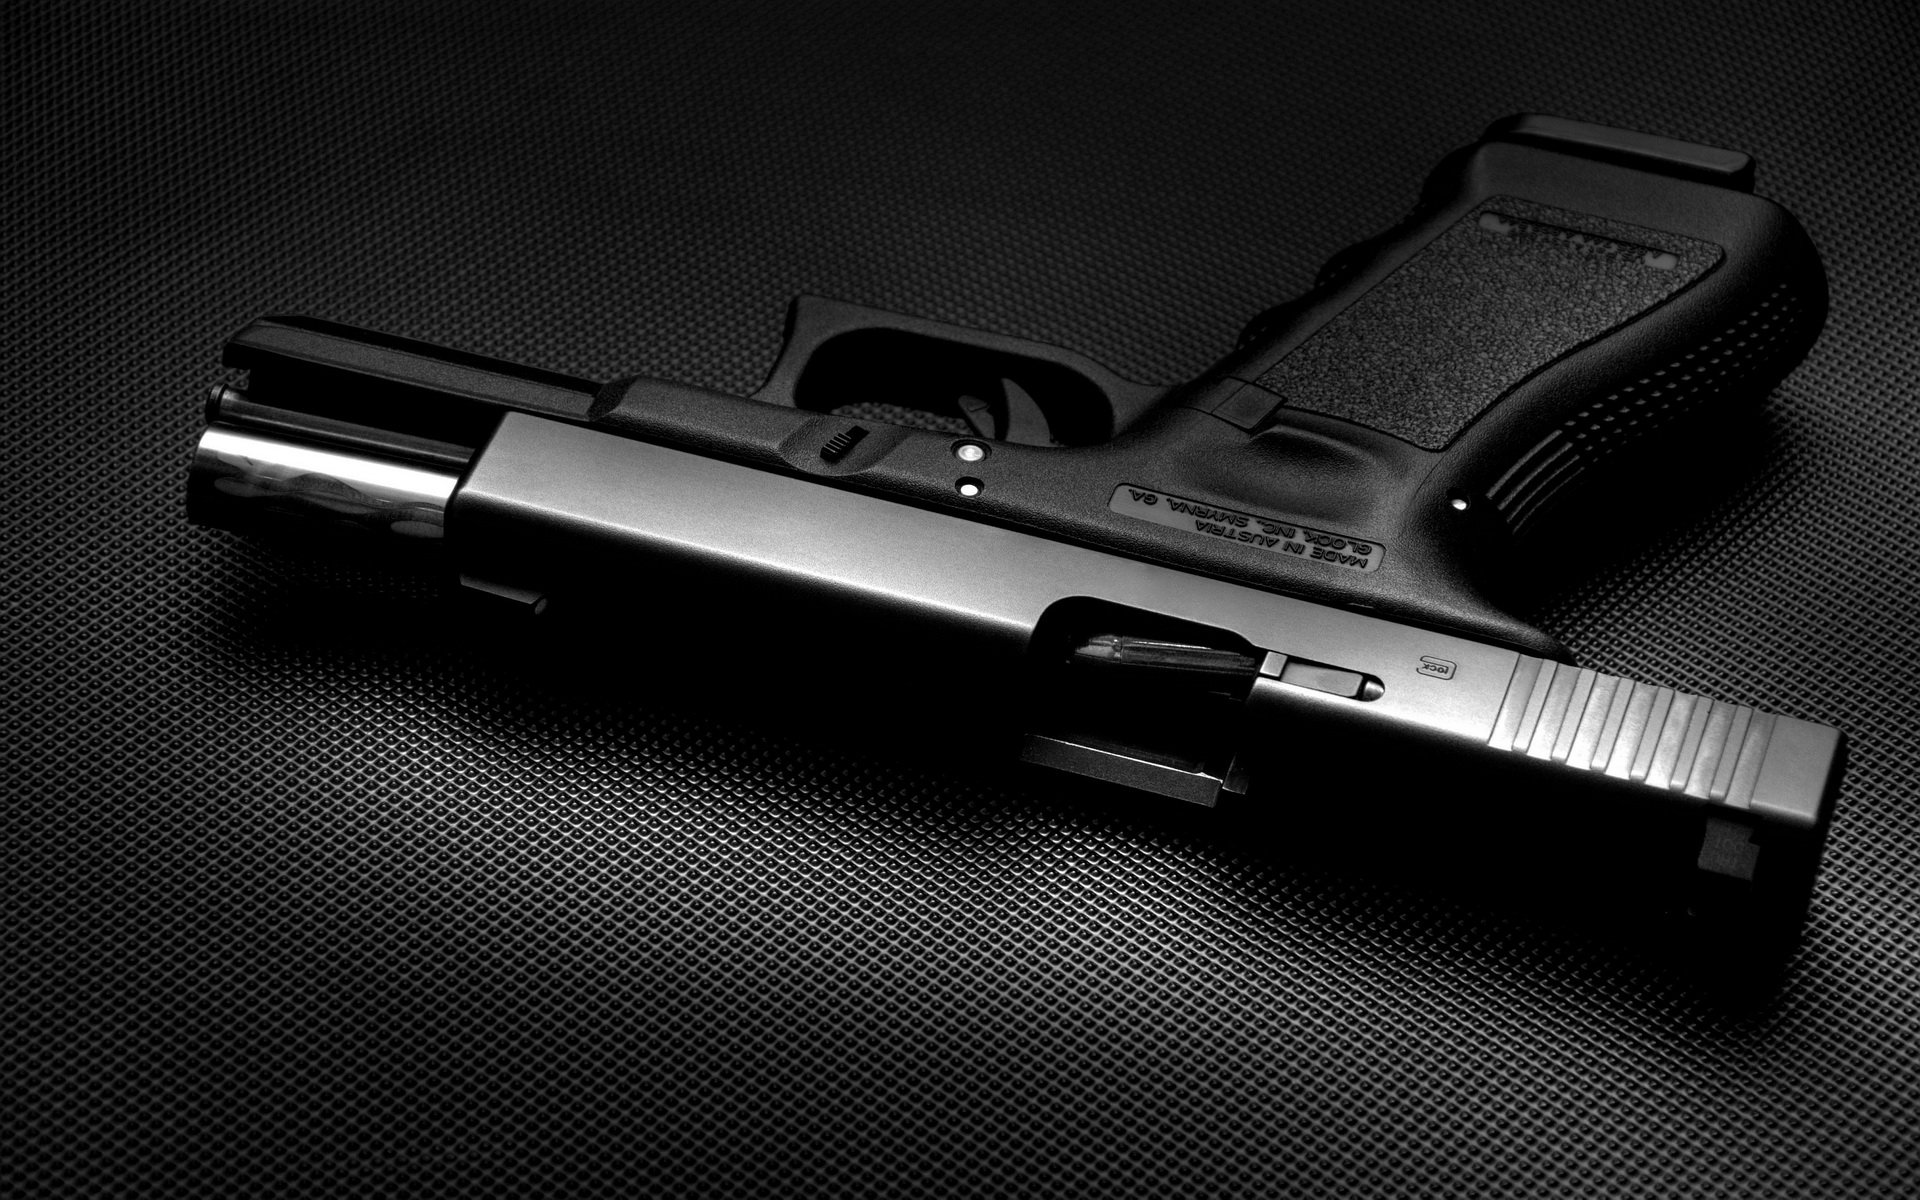 Glock Iphone Wallpaper Glock 17 Full Hd Wallpaper And Background Image